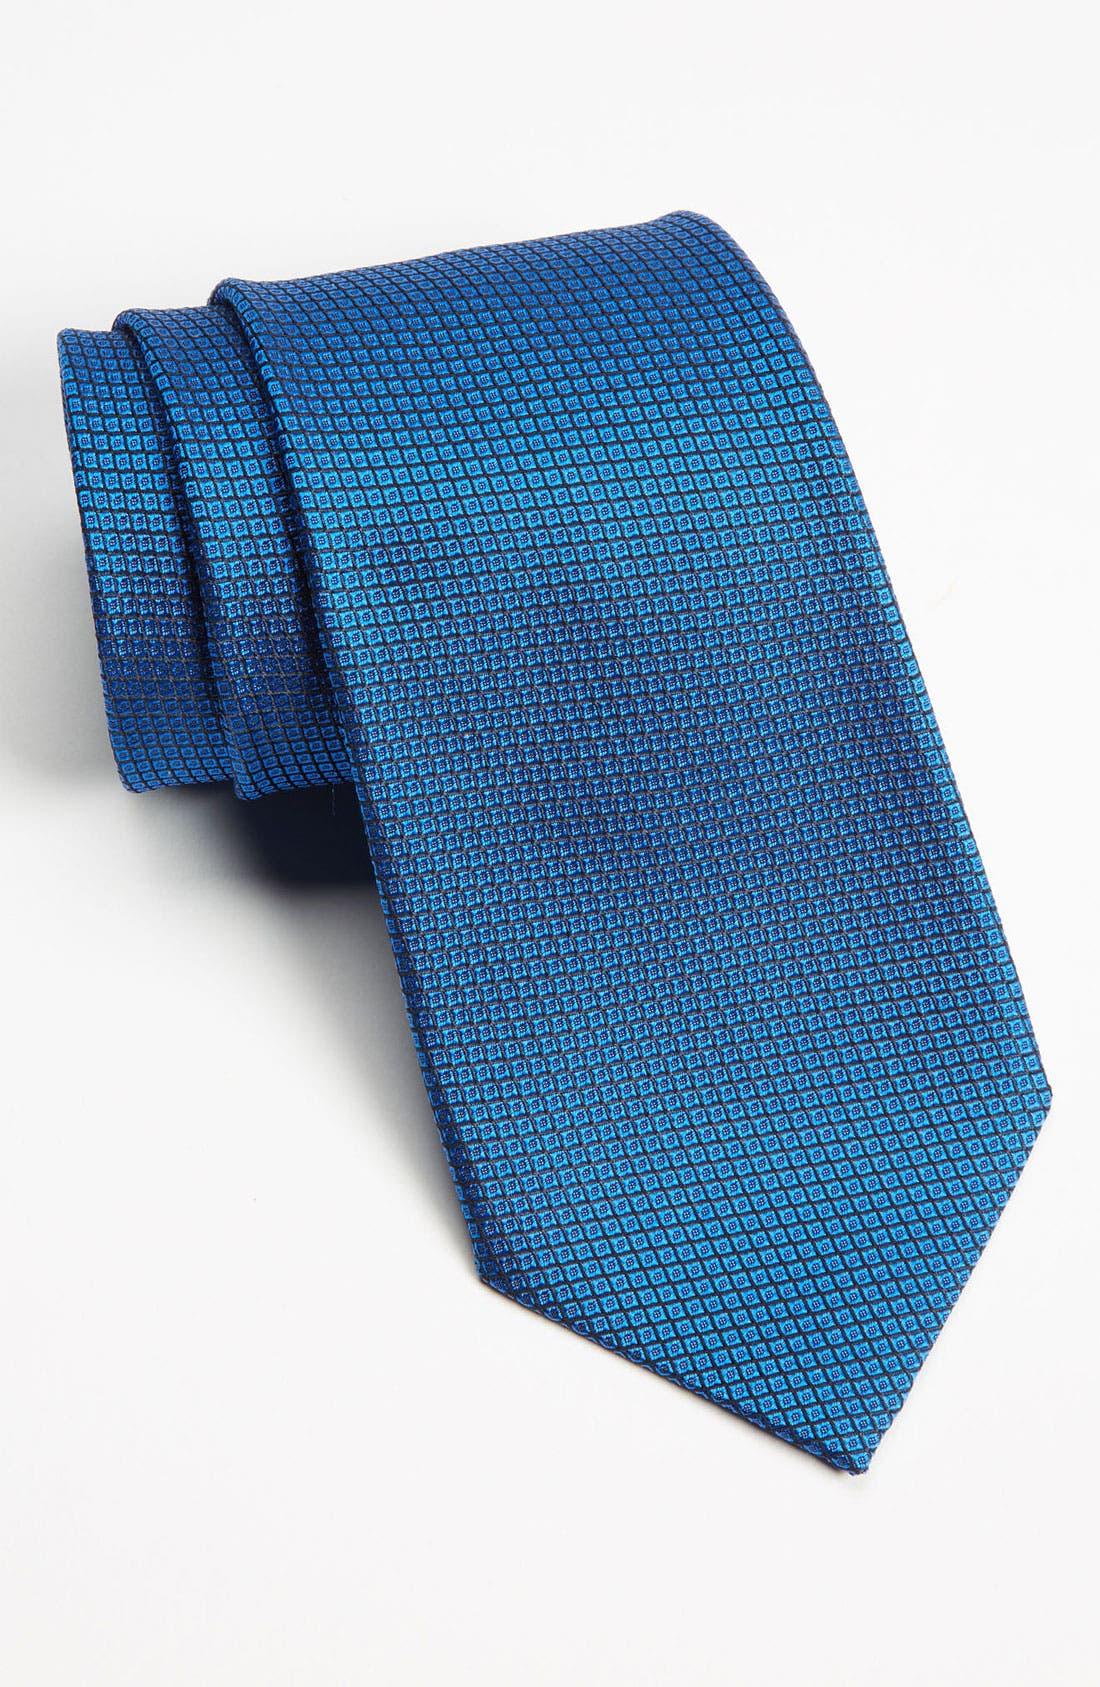 Alternate Image 1 Selected - Z Zegna Bird's Eye Silk Woven Tie